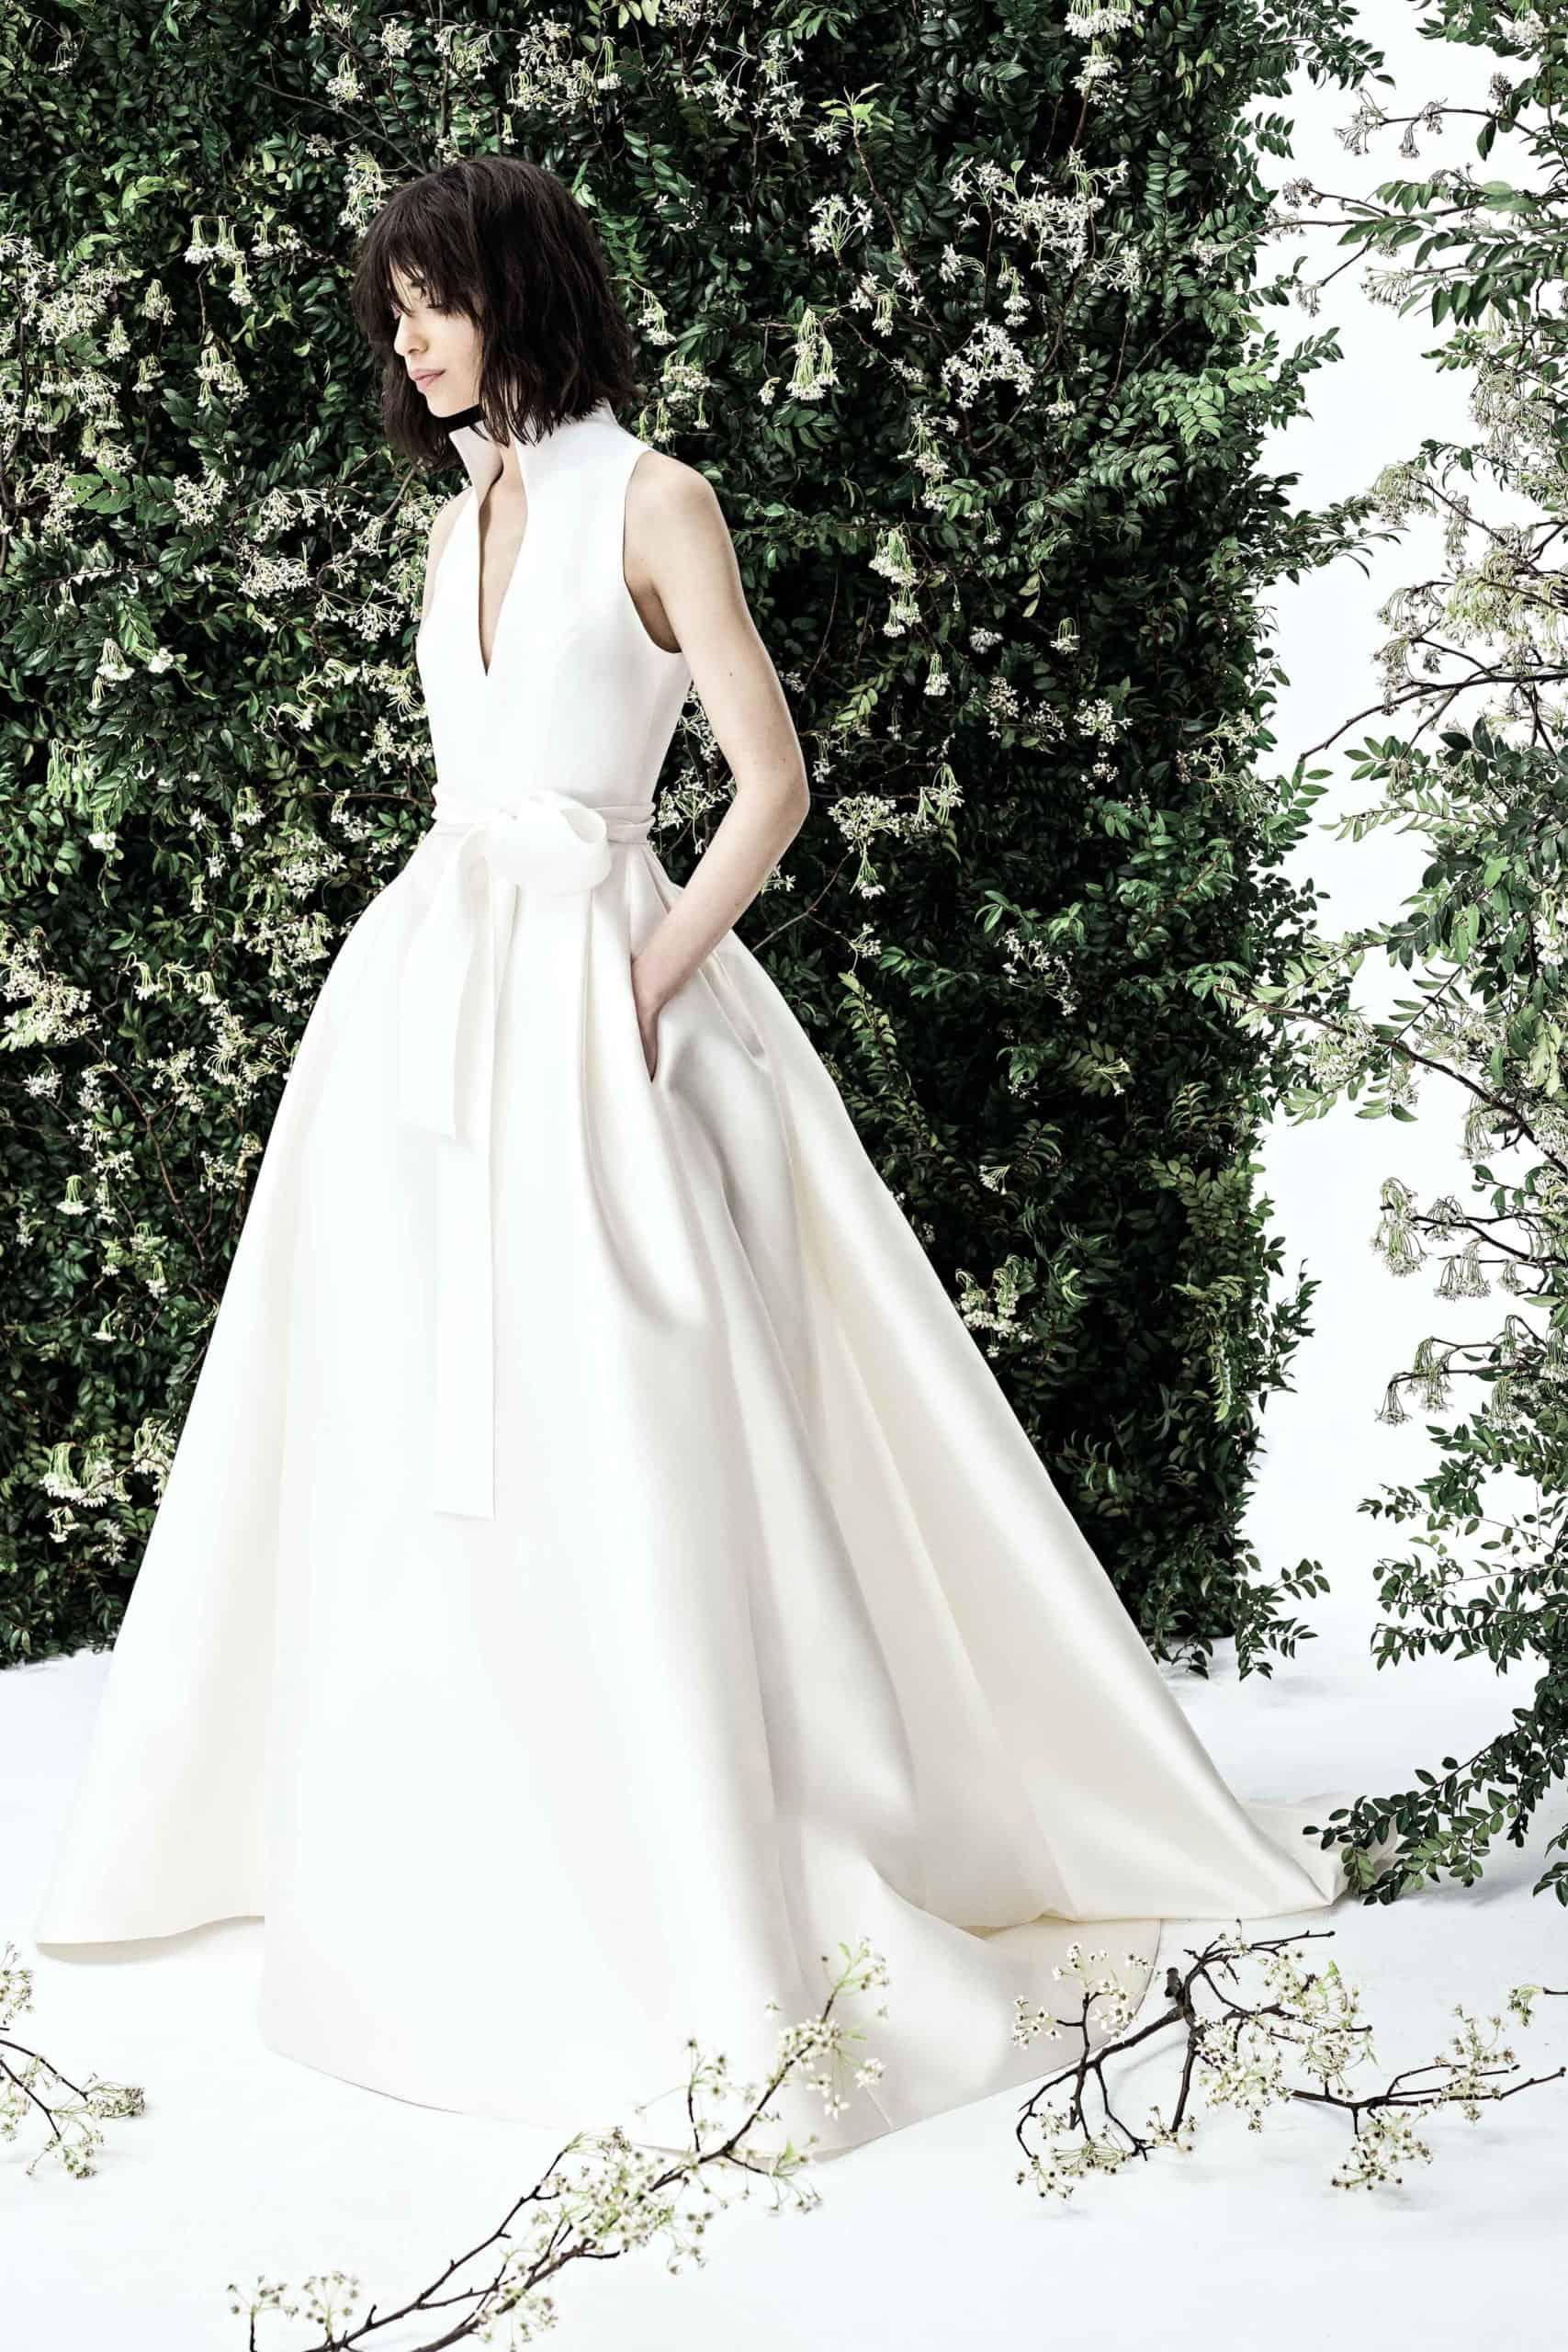 satin wedding dress with pockets by Carolina Herrera